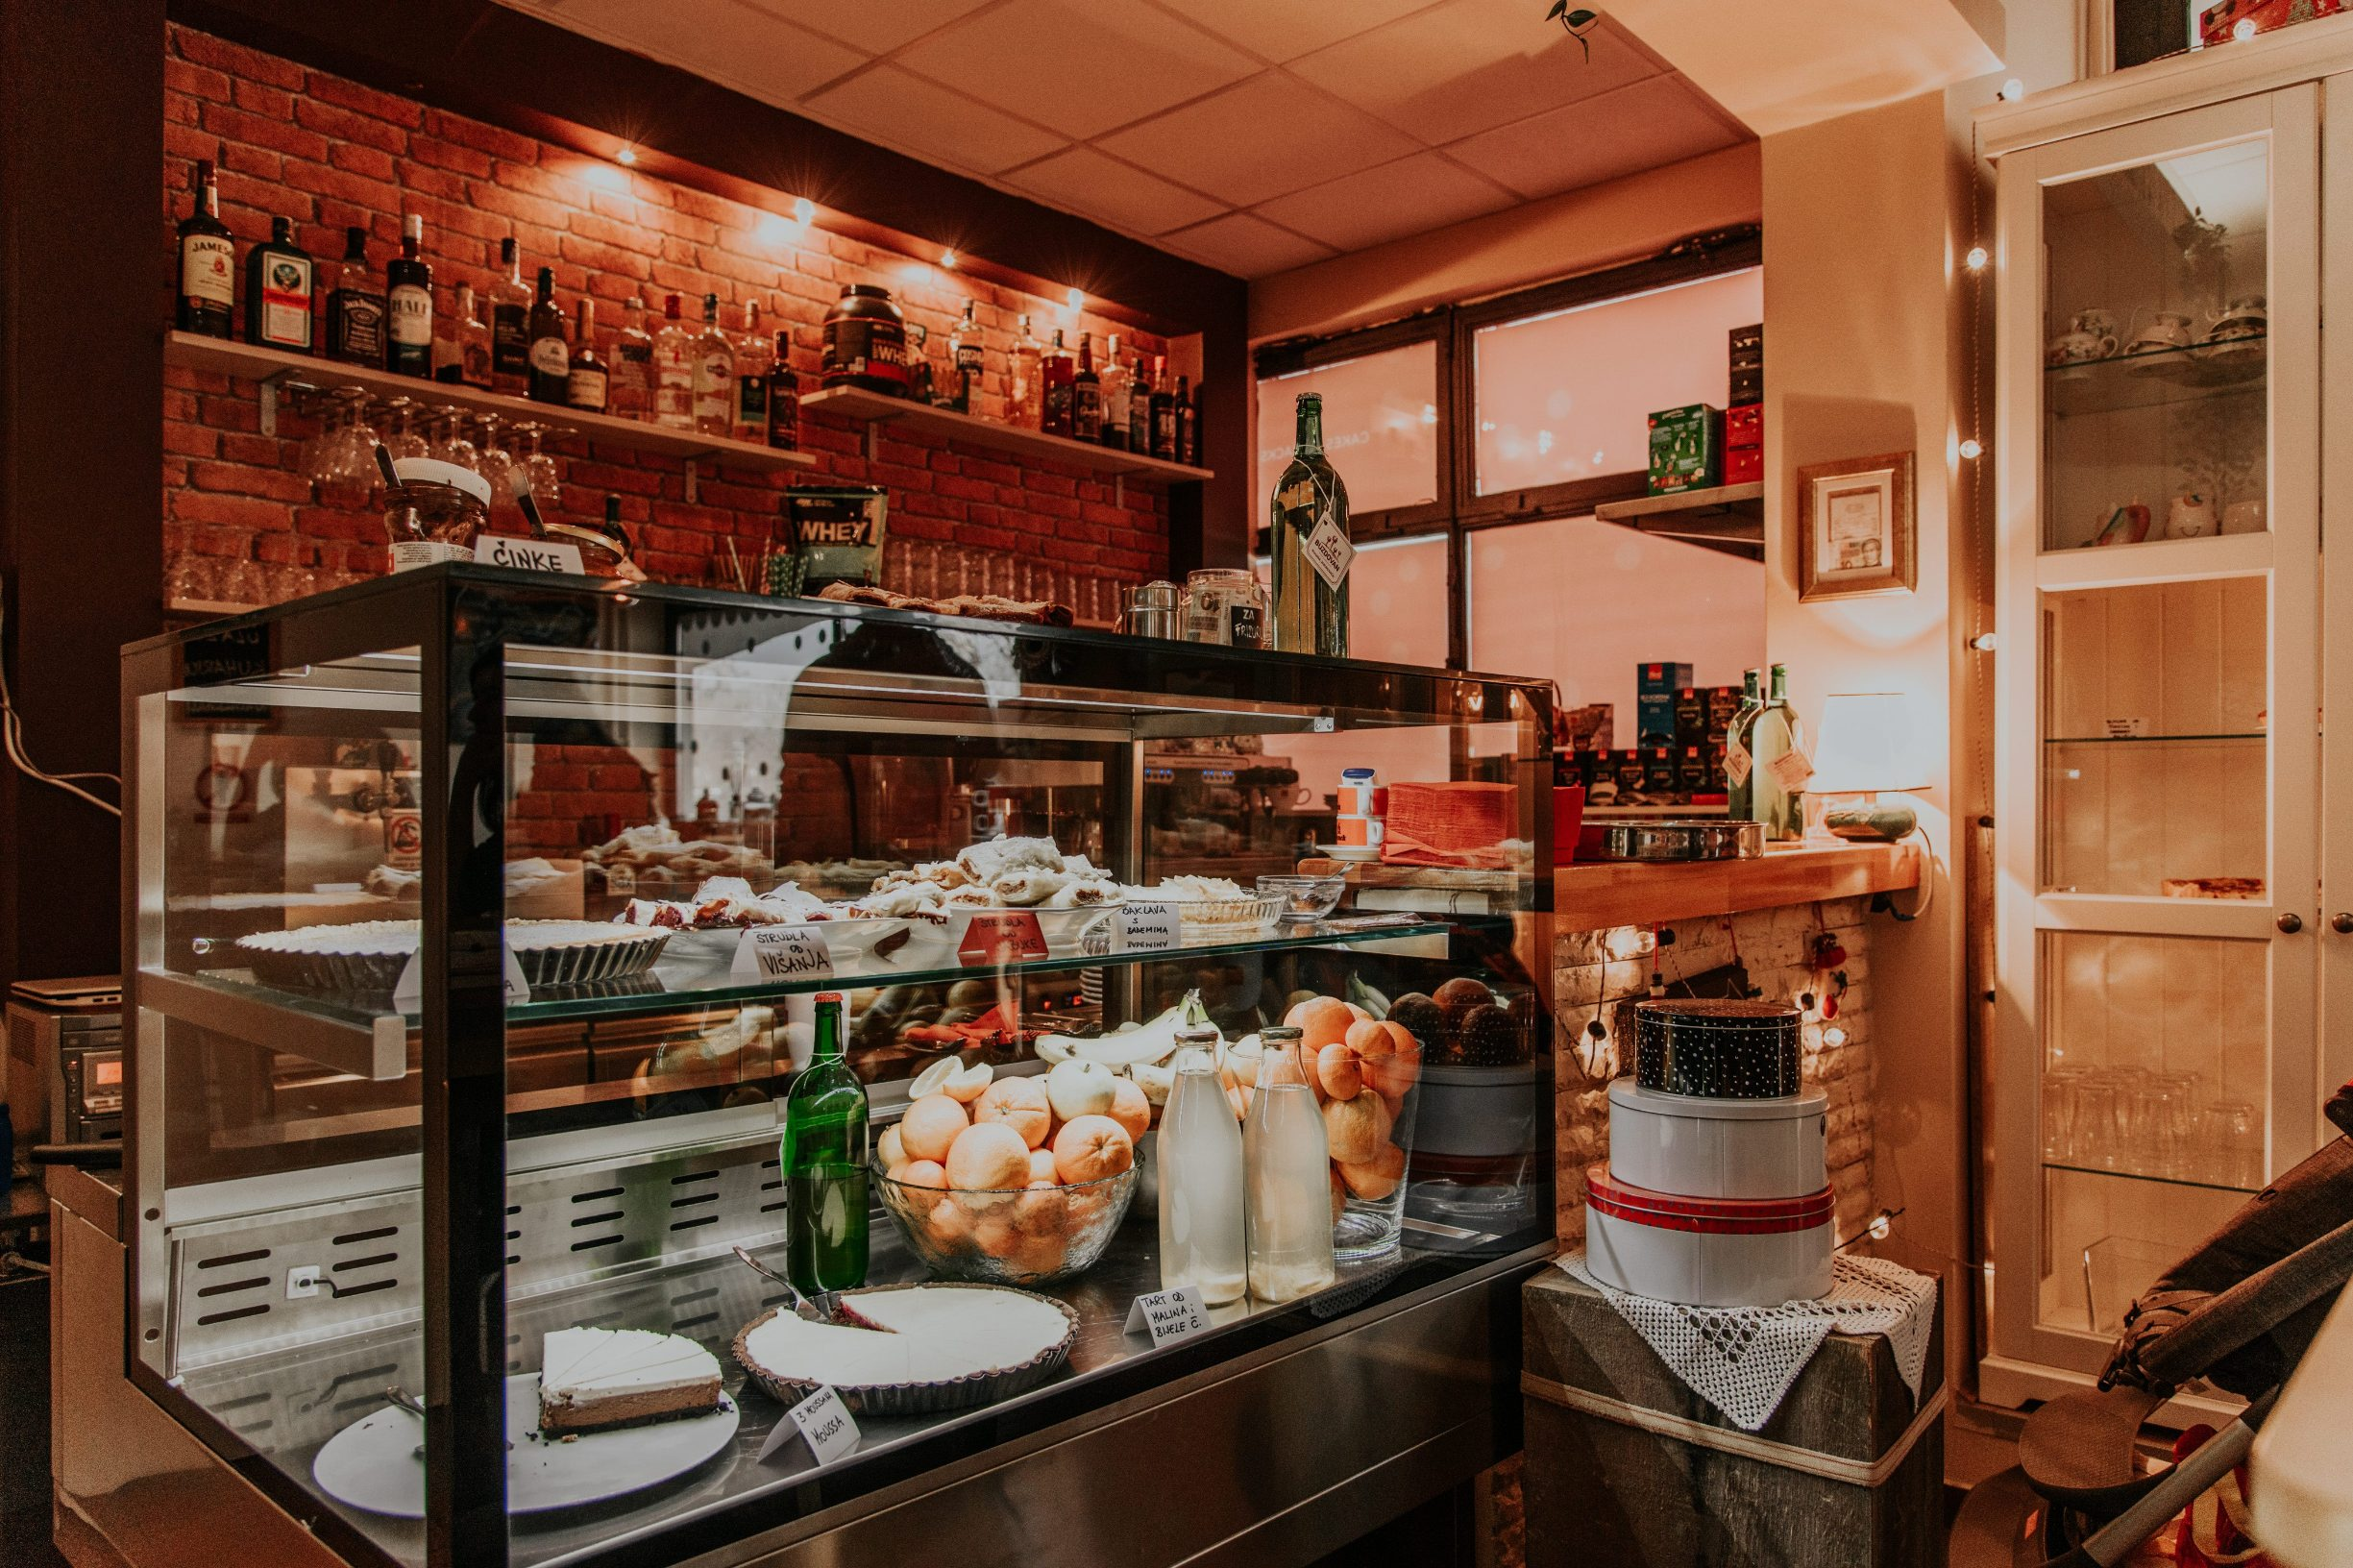 Zagreb, 090120 Restoran Daling and shegrs na Ravnicama.  Foto: Marko Miscevic / Cropix